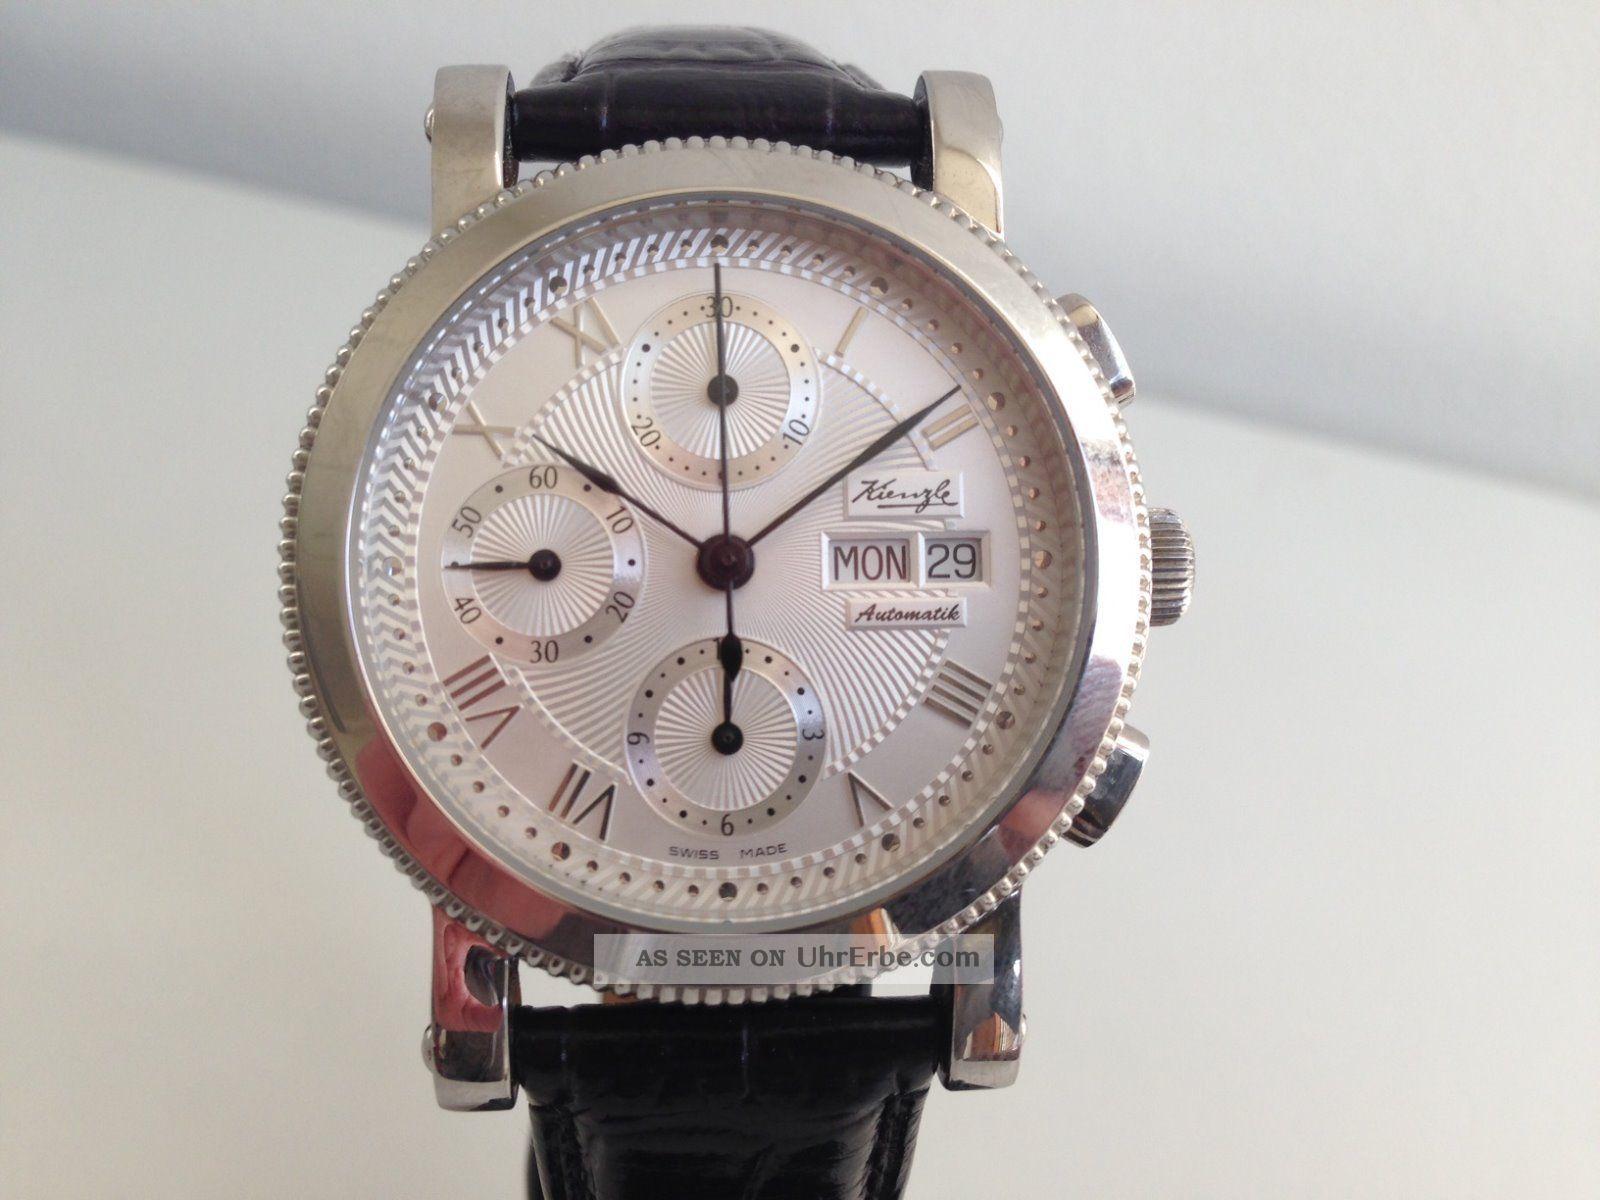 Sammlerstück Sehr Selten Kienzle Chronograph Eta Valjoux 7750 Swiss Made Armbanduhren Bild